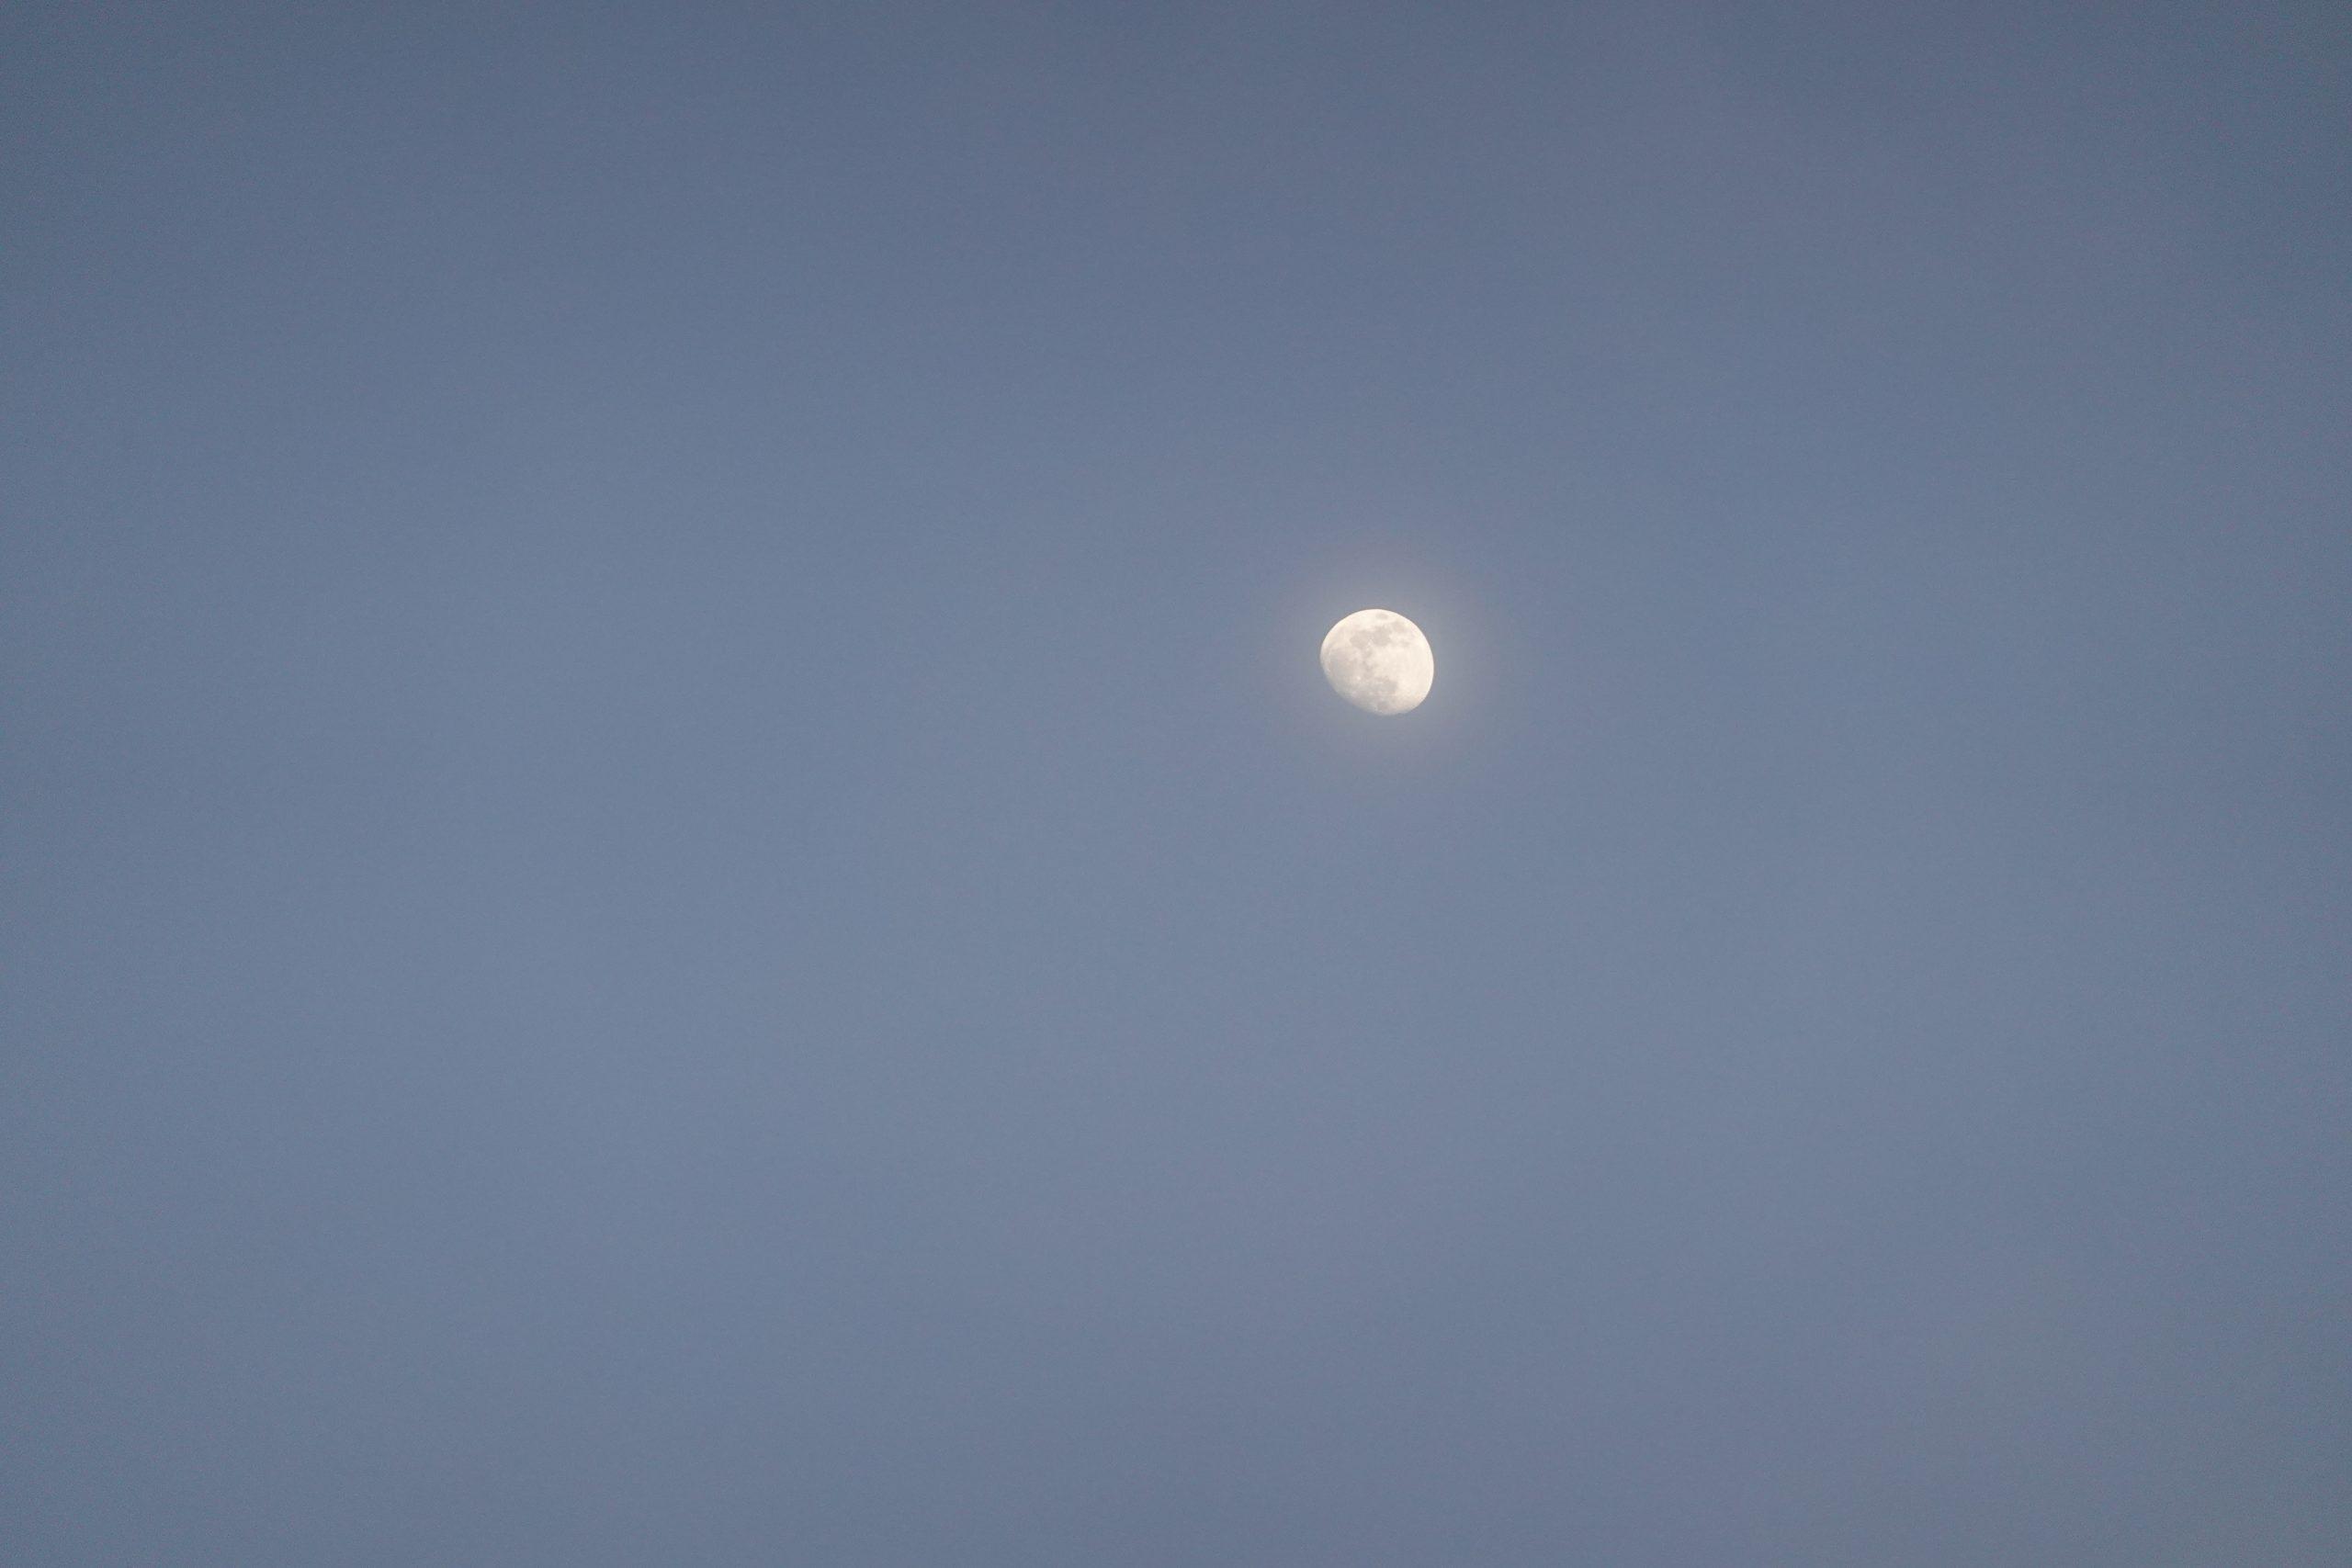 【SONY】RX100M6と一緒に空をじっくりと眺めてみる。